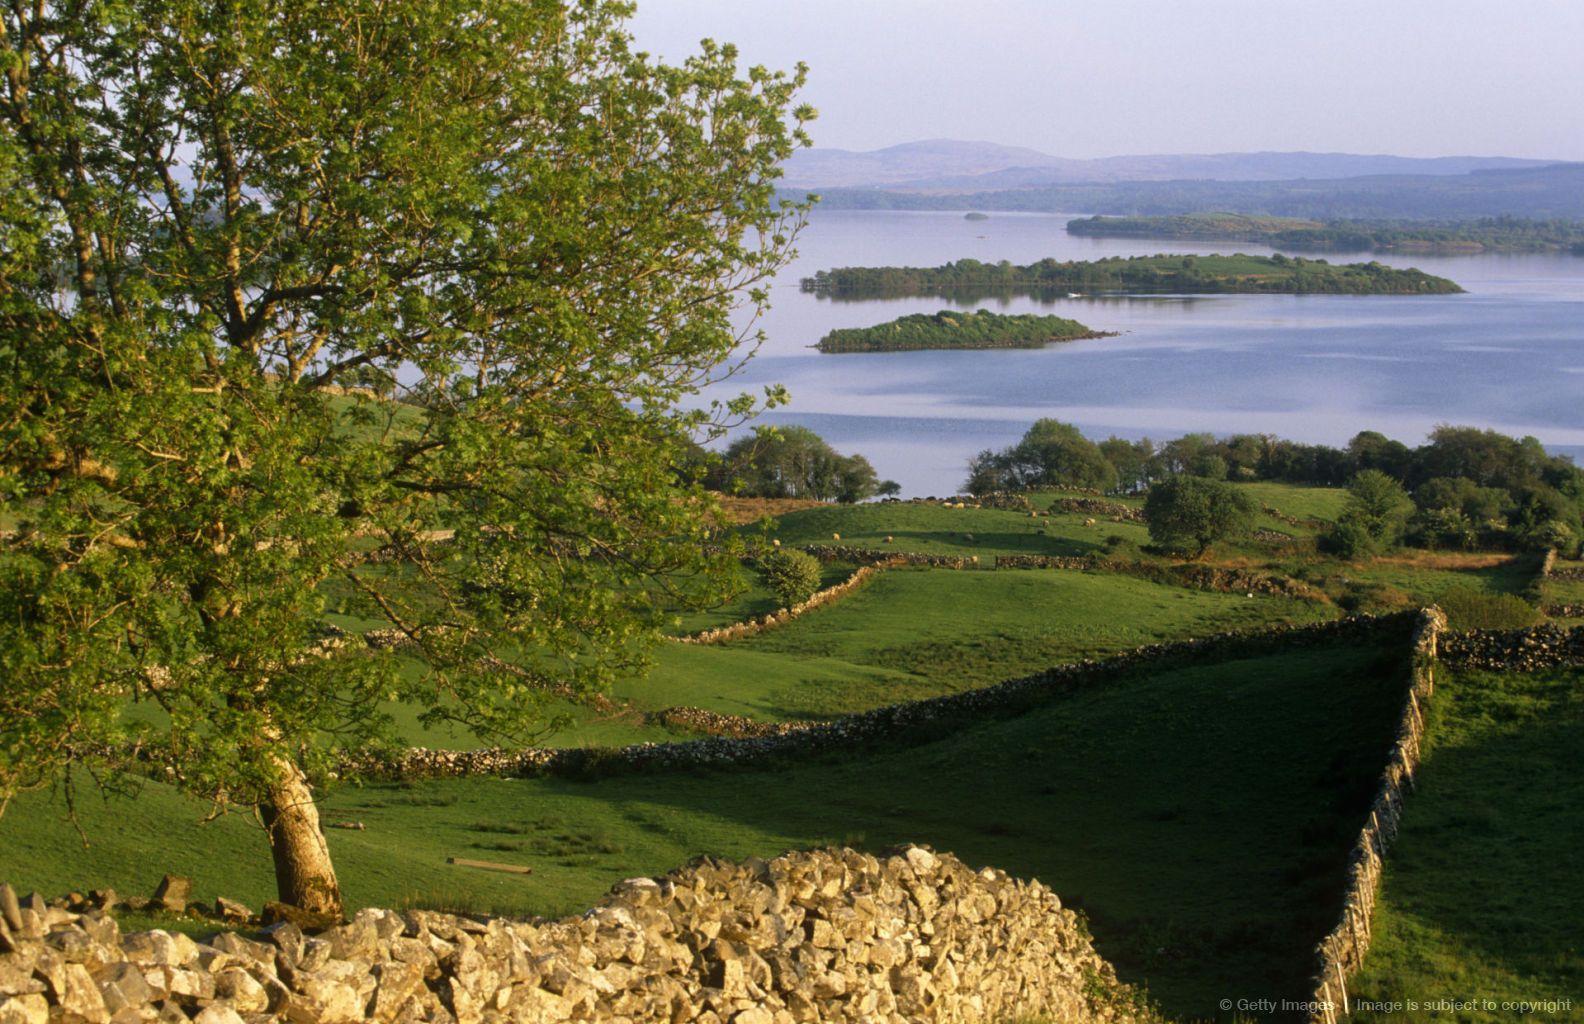 Image detail for Ireland, Galway. Lough Corrib, Connemara